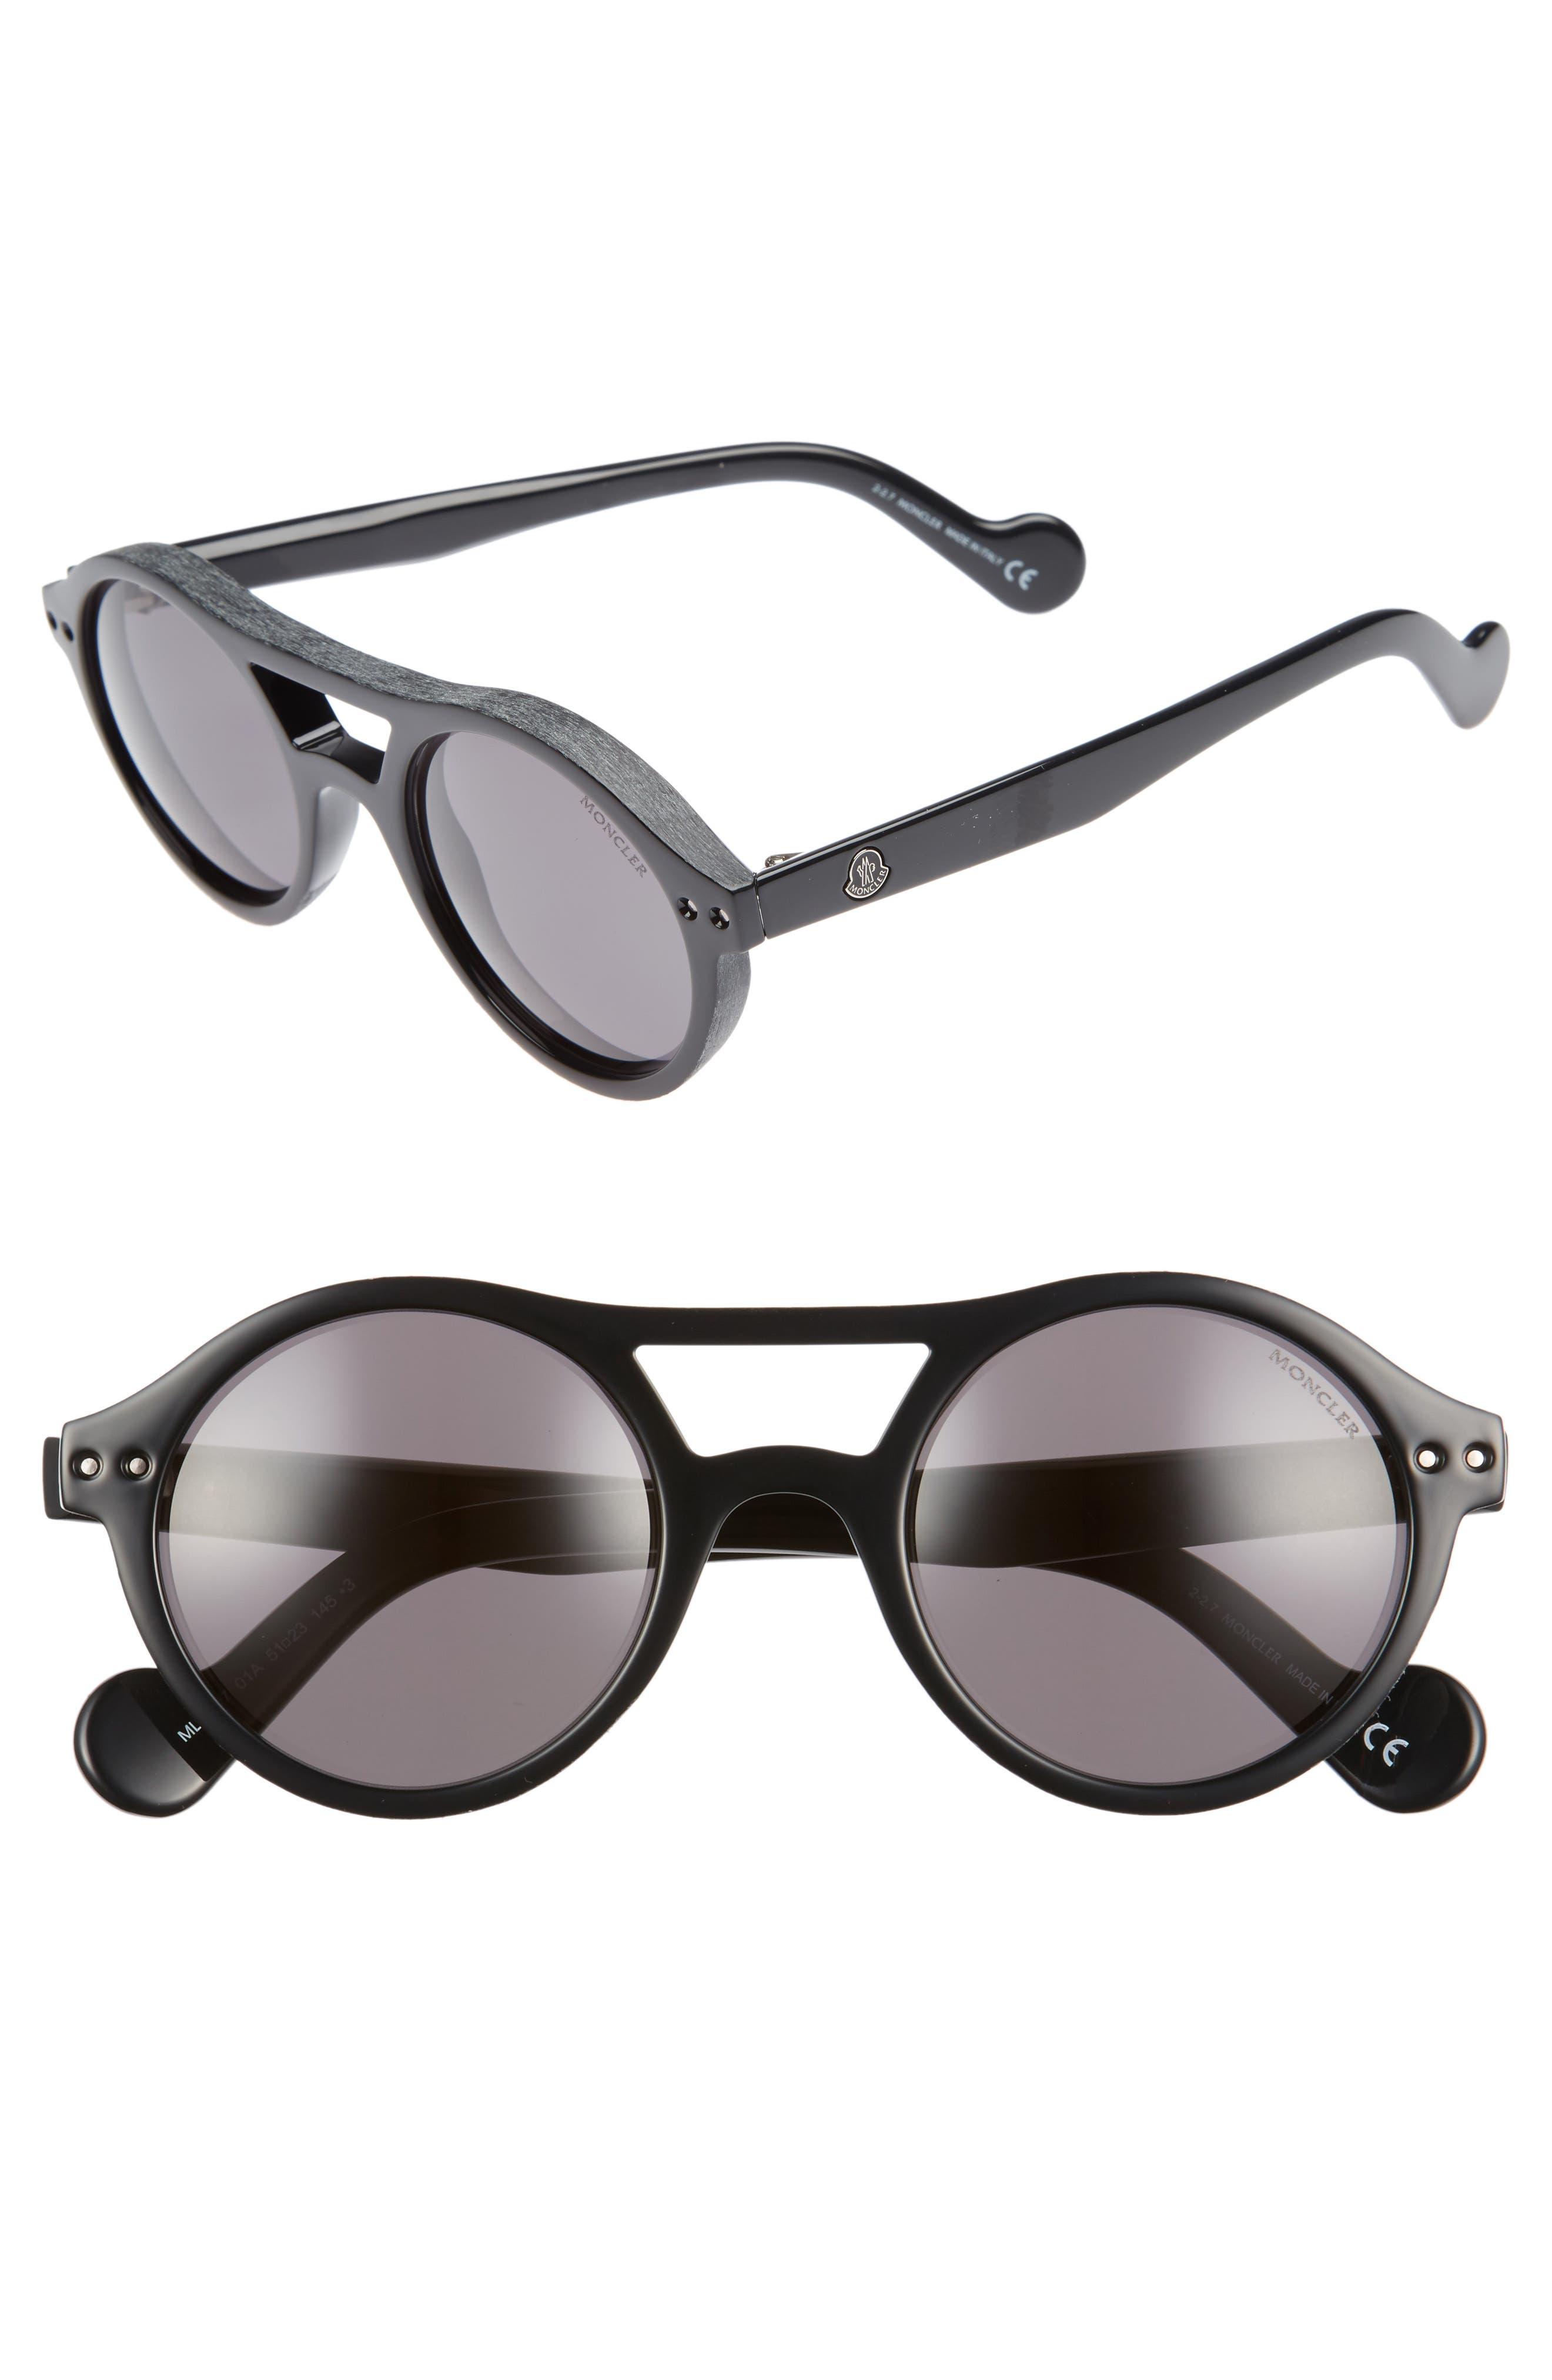 51mm Round Sunglasses,                             Main thumbnail 1, color,                             BLACK/ SMOKE